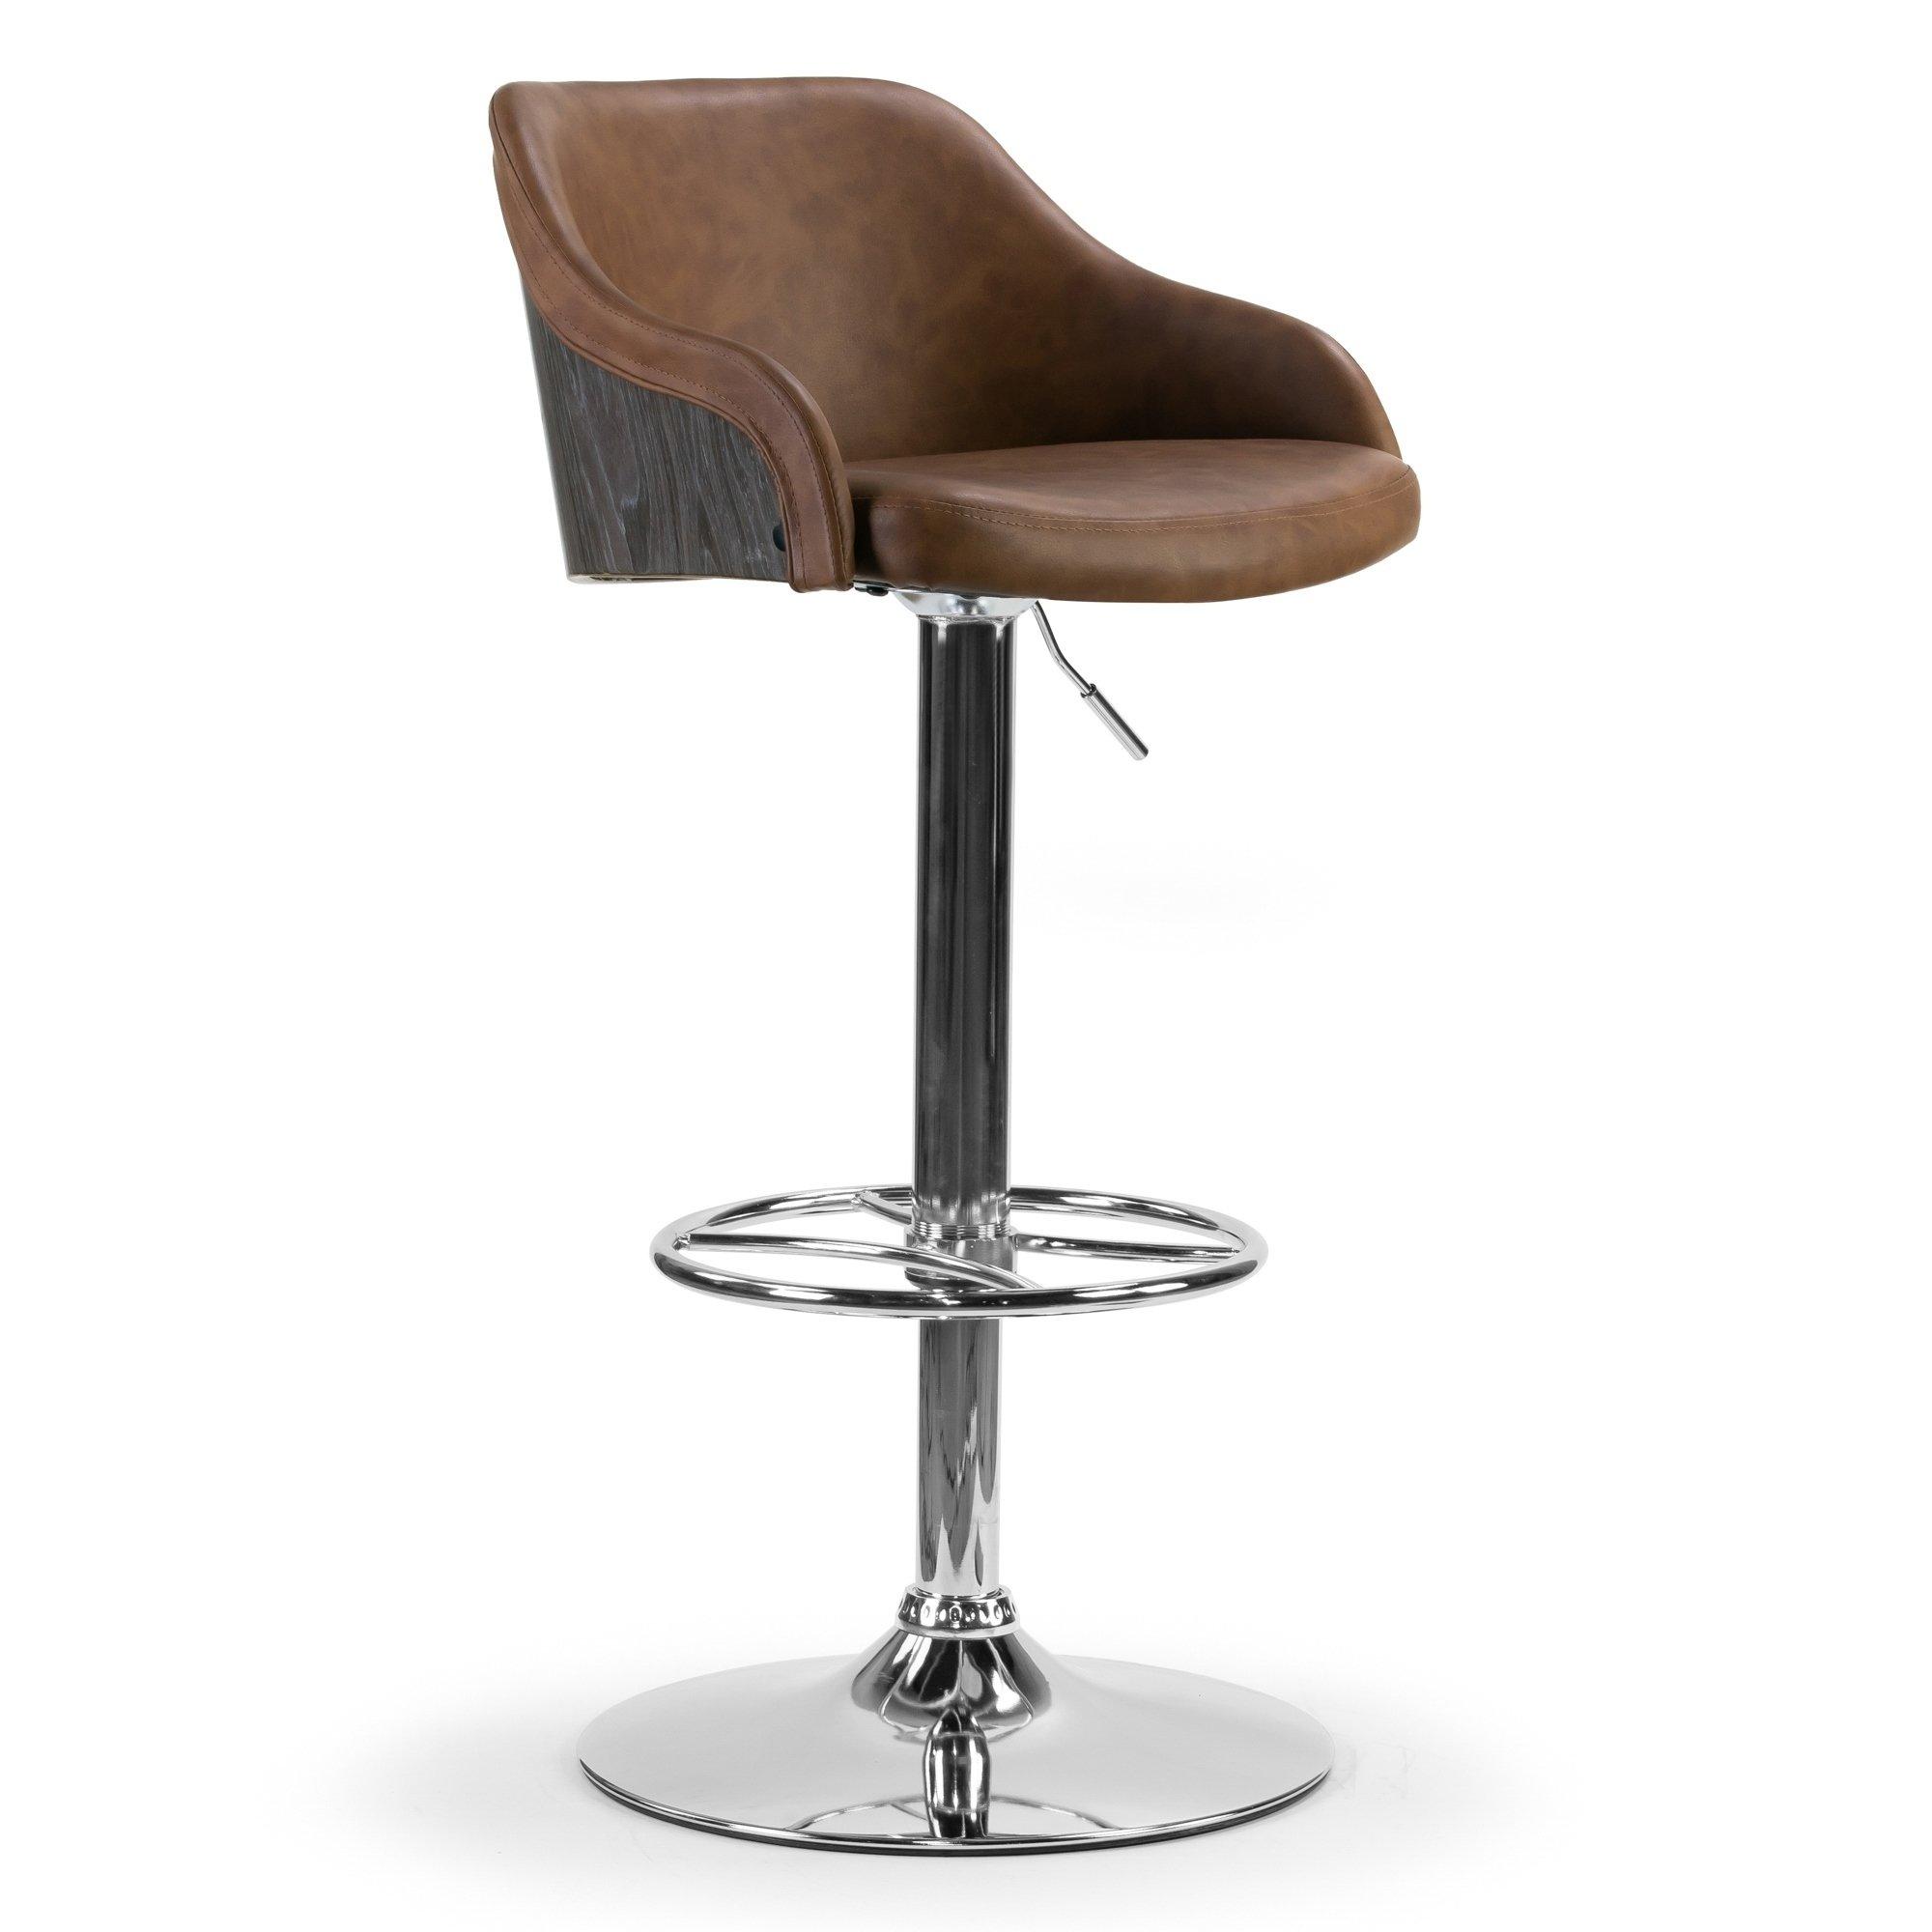 Strange Amada Grey And Brown Metal Upholstered Adjustable Height Ncnpc Chair Design For Home Ncnpcorg